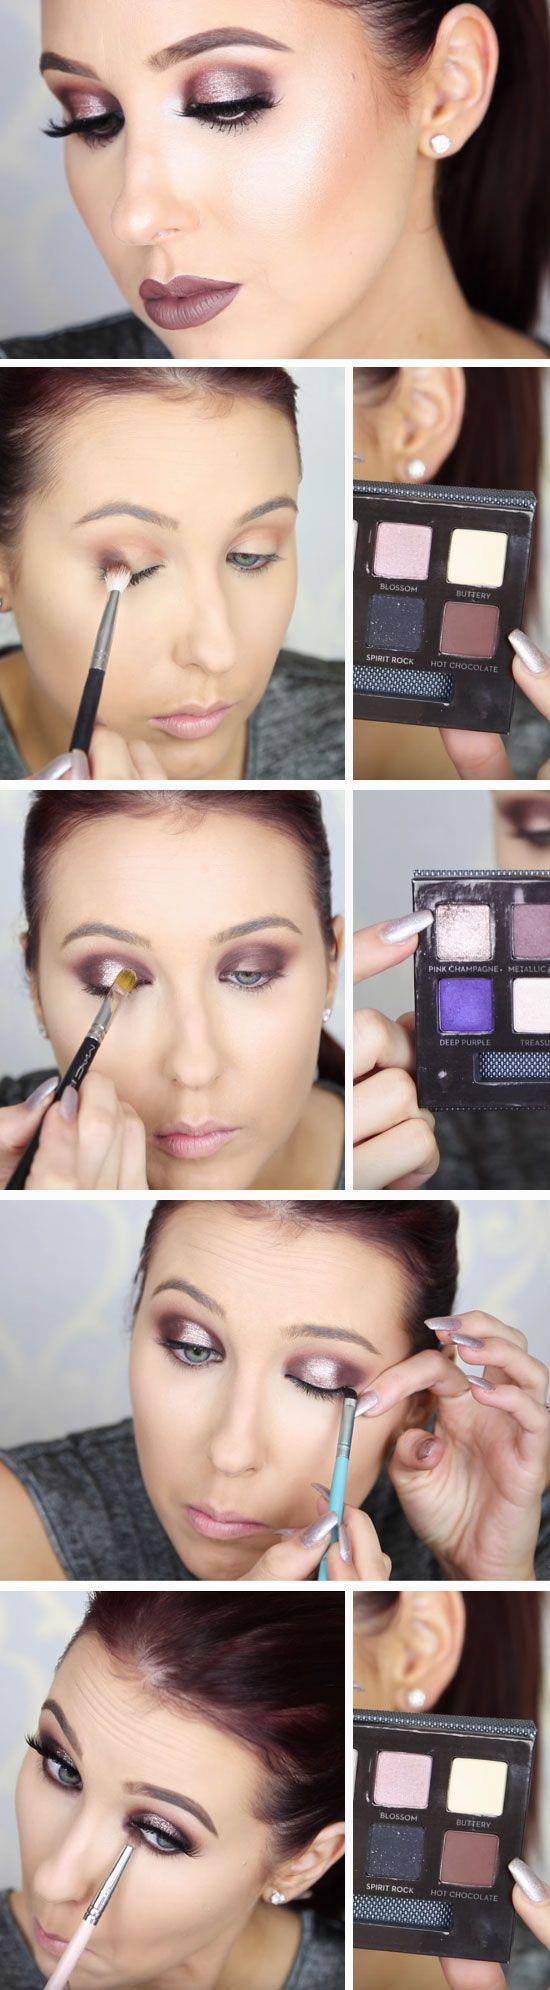 Halo Smokey Eye | Awesome Prom Makeup Ideas Full Face | DIY New Years Eve Makeup Looks Eyeshadows